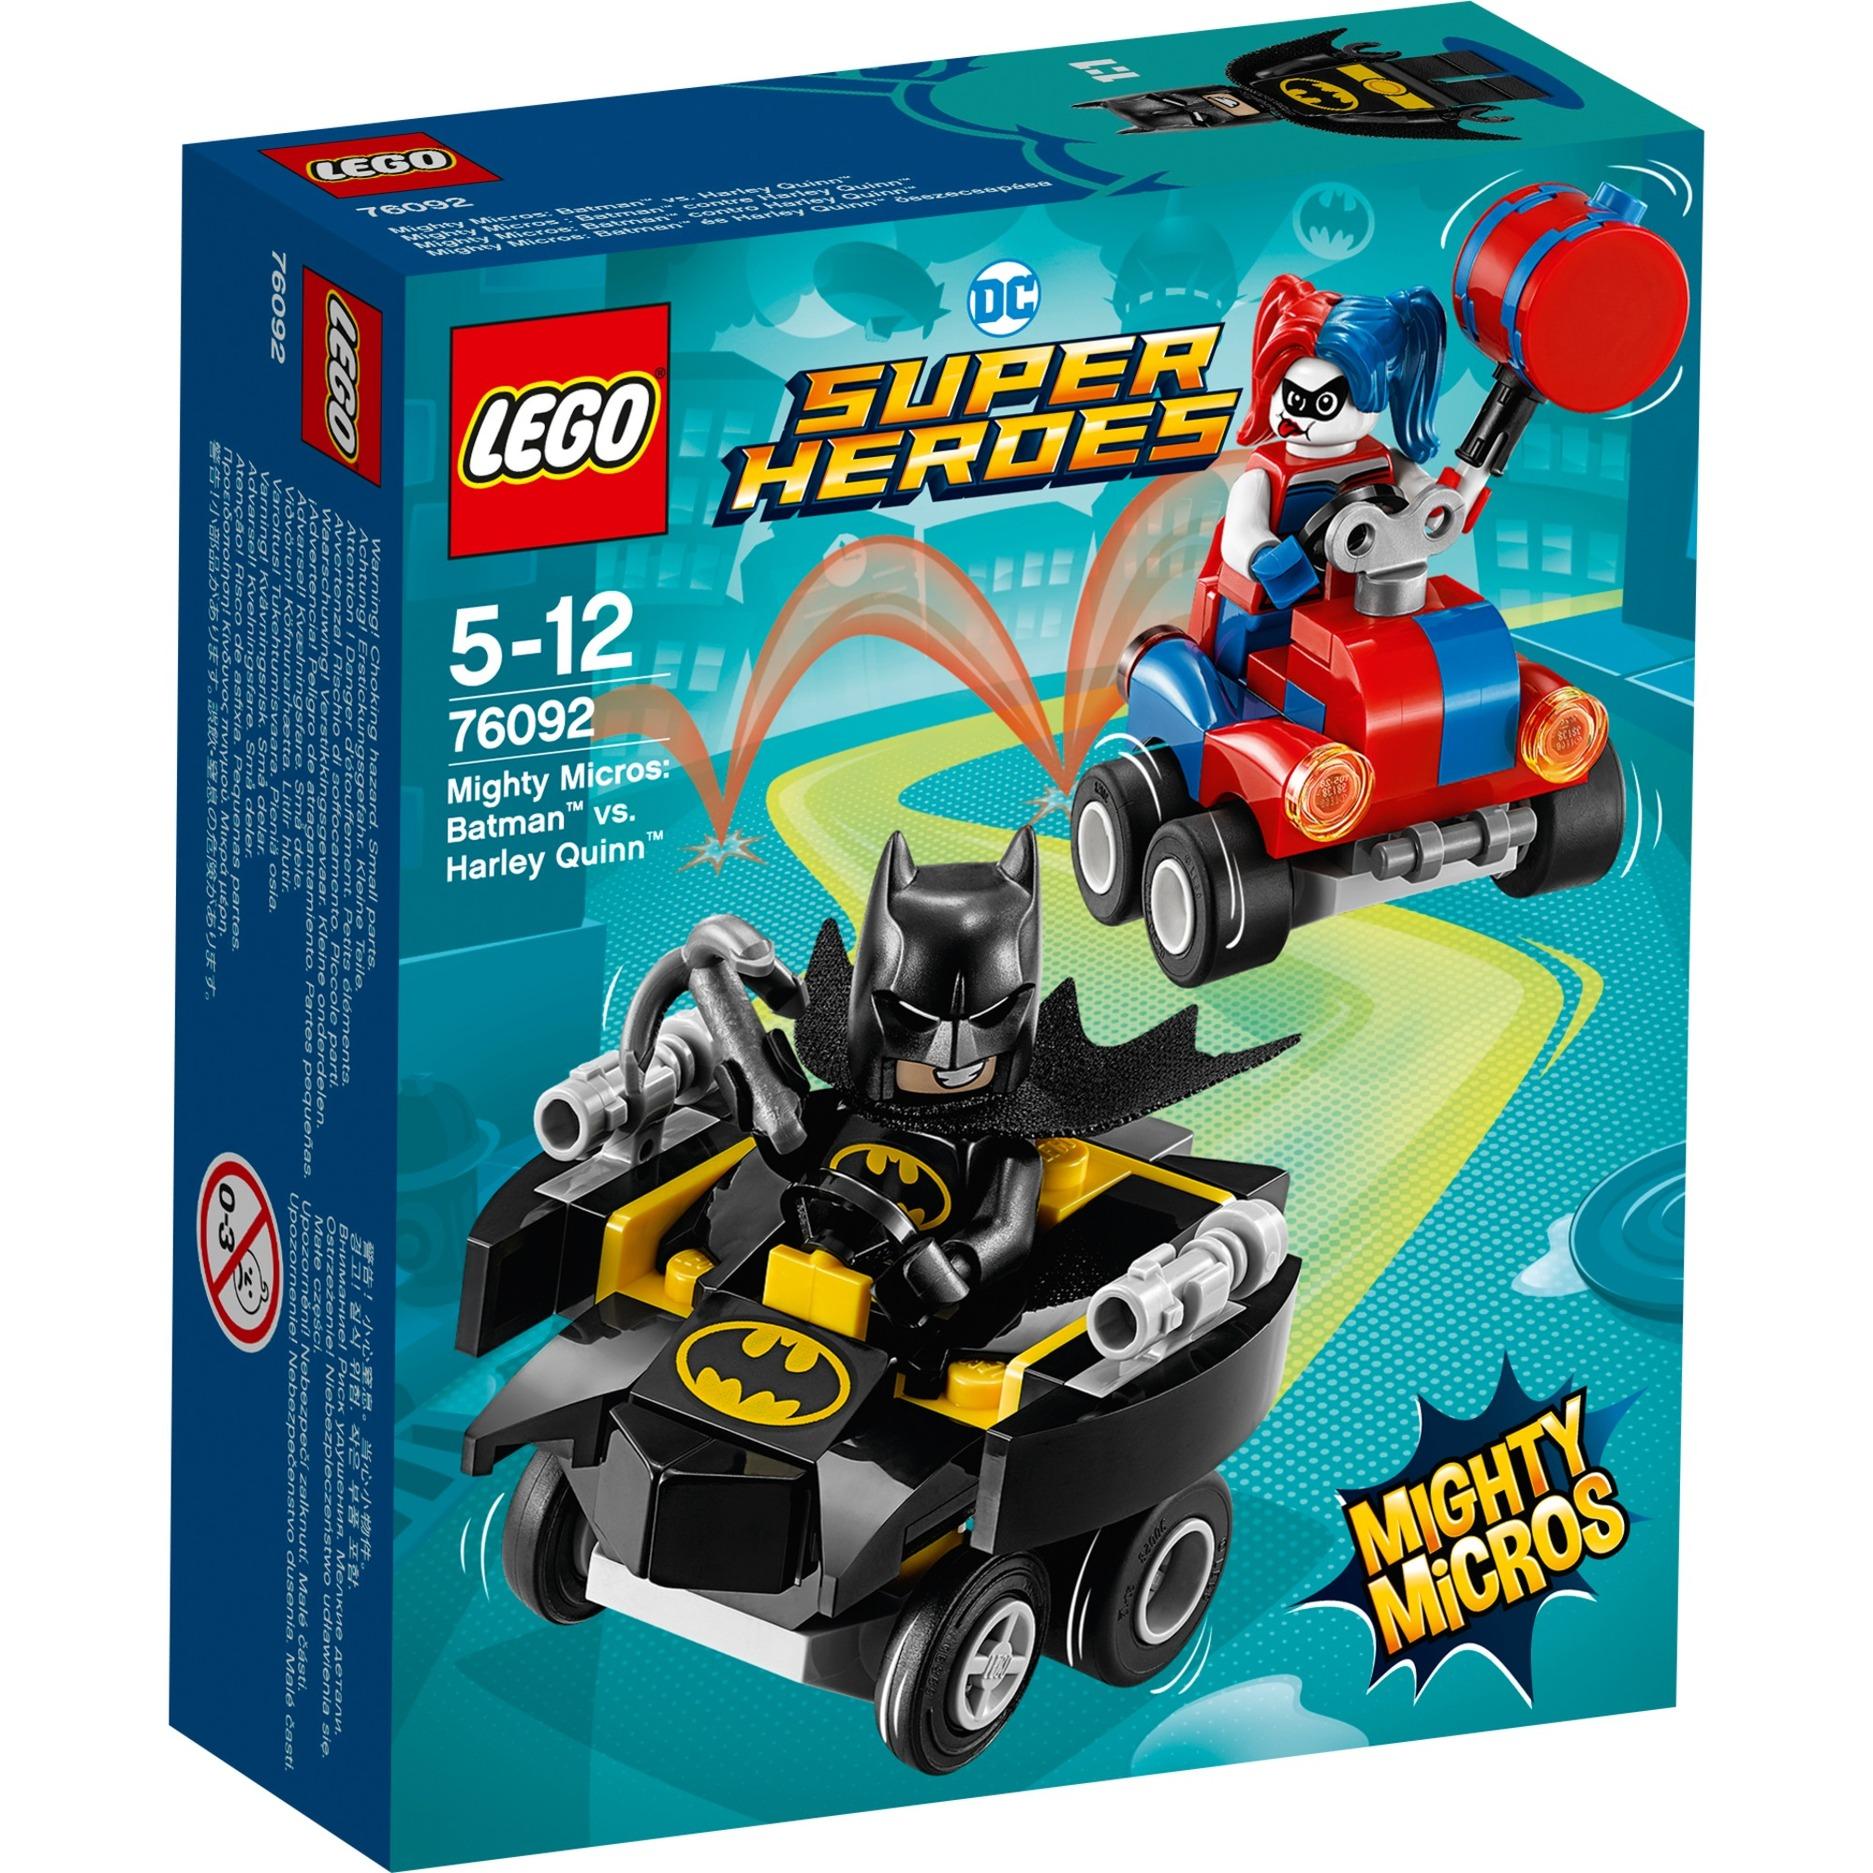 LEGO Super Heroes - Mighty Micros Batman vs. Harley Quinn - 76092